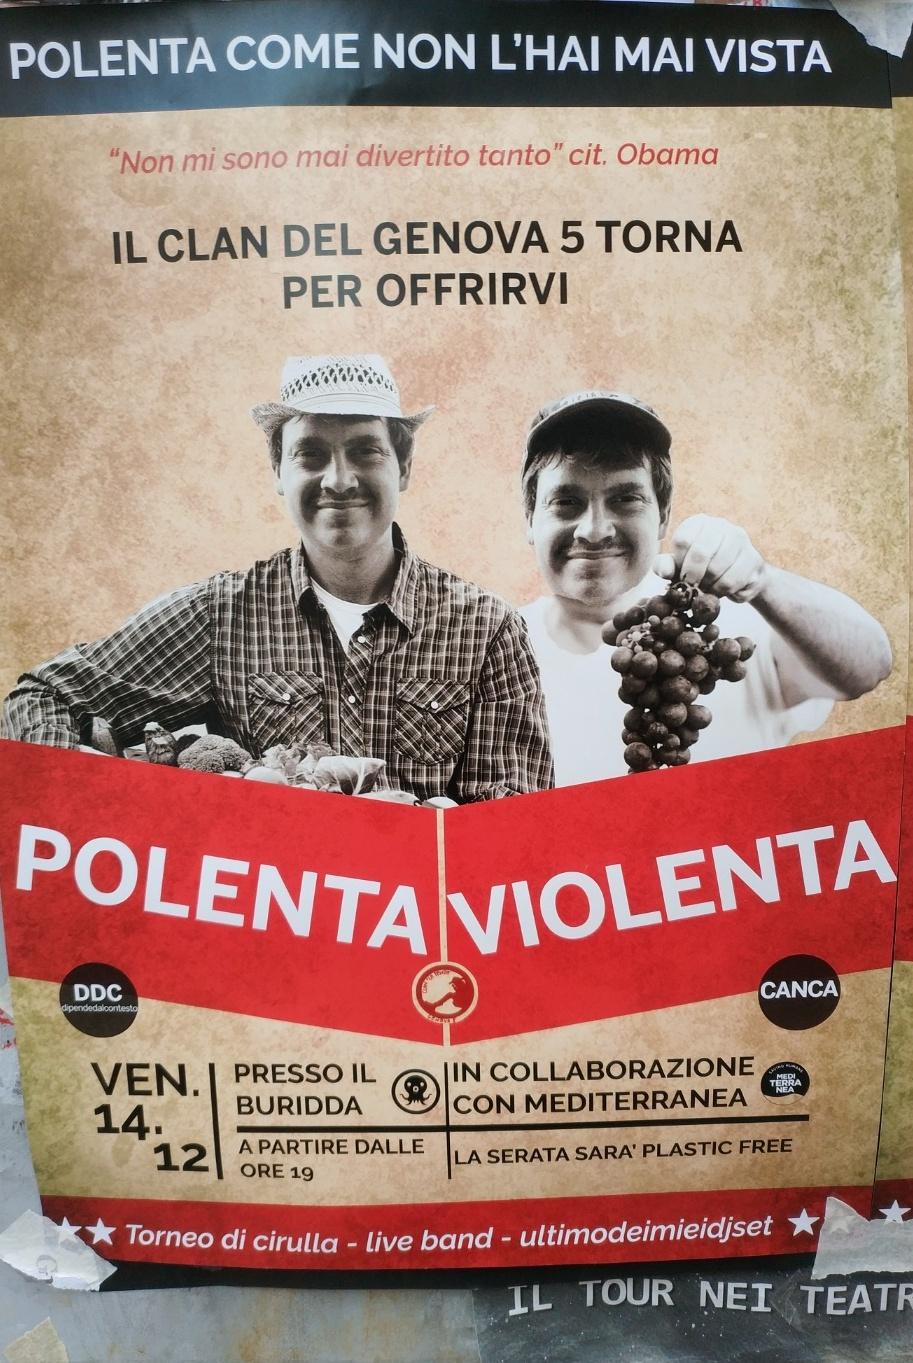 POLENTA VIOLENTA LSOA Buridda Corso Monte Grappa 39, 16137 Genova Dal 14/12/2018 Al 14/12/2018 19:00 - 02:00